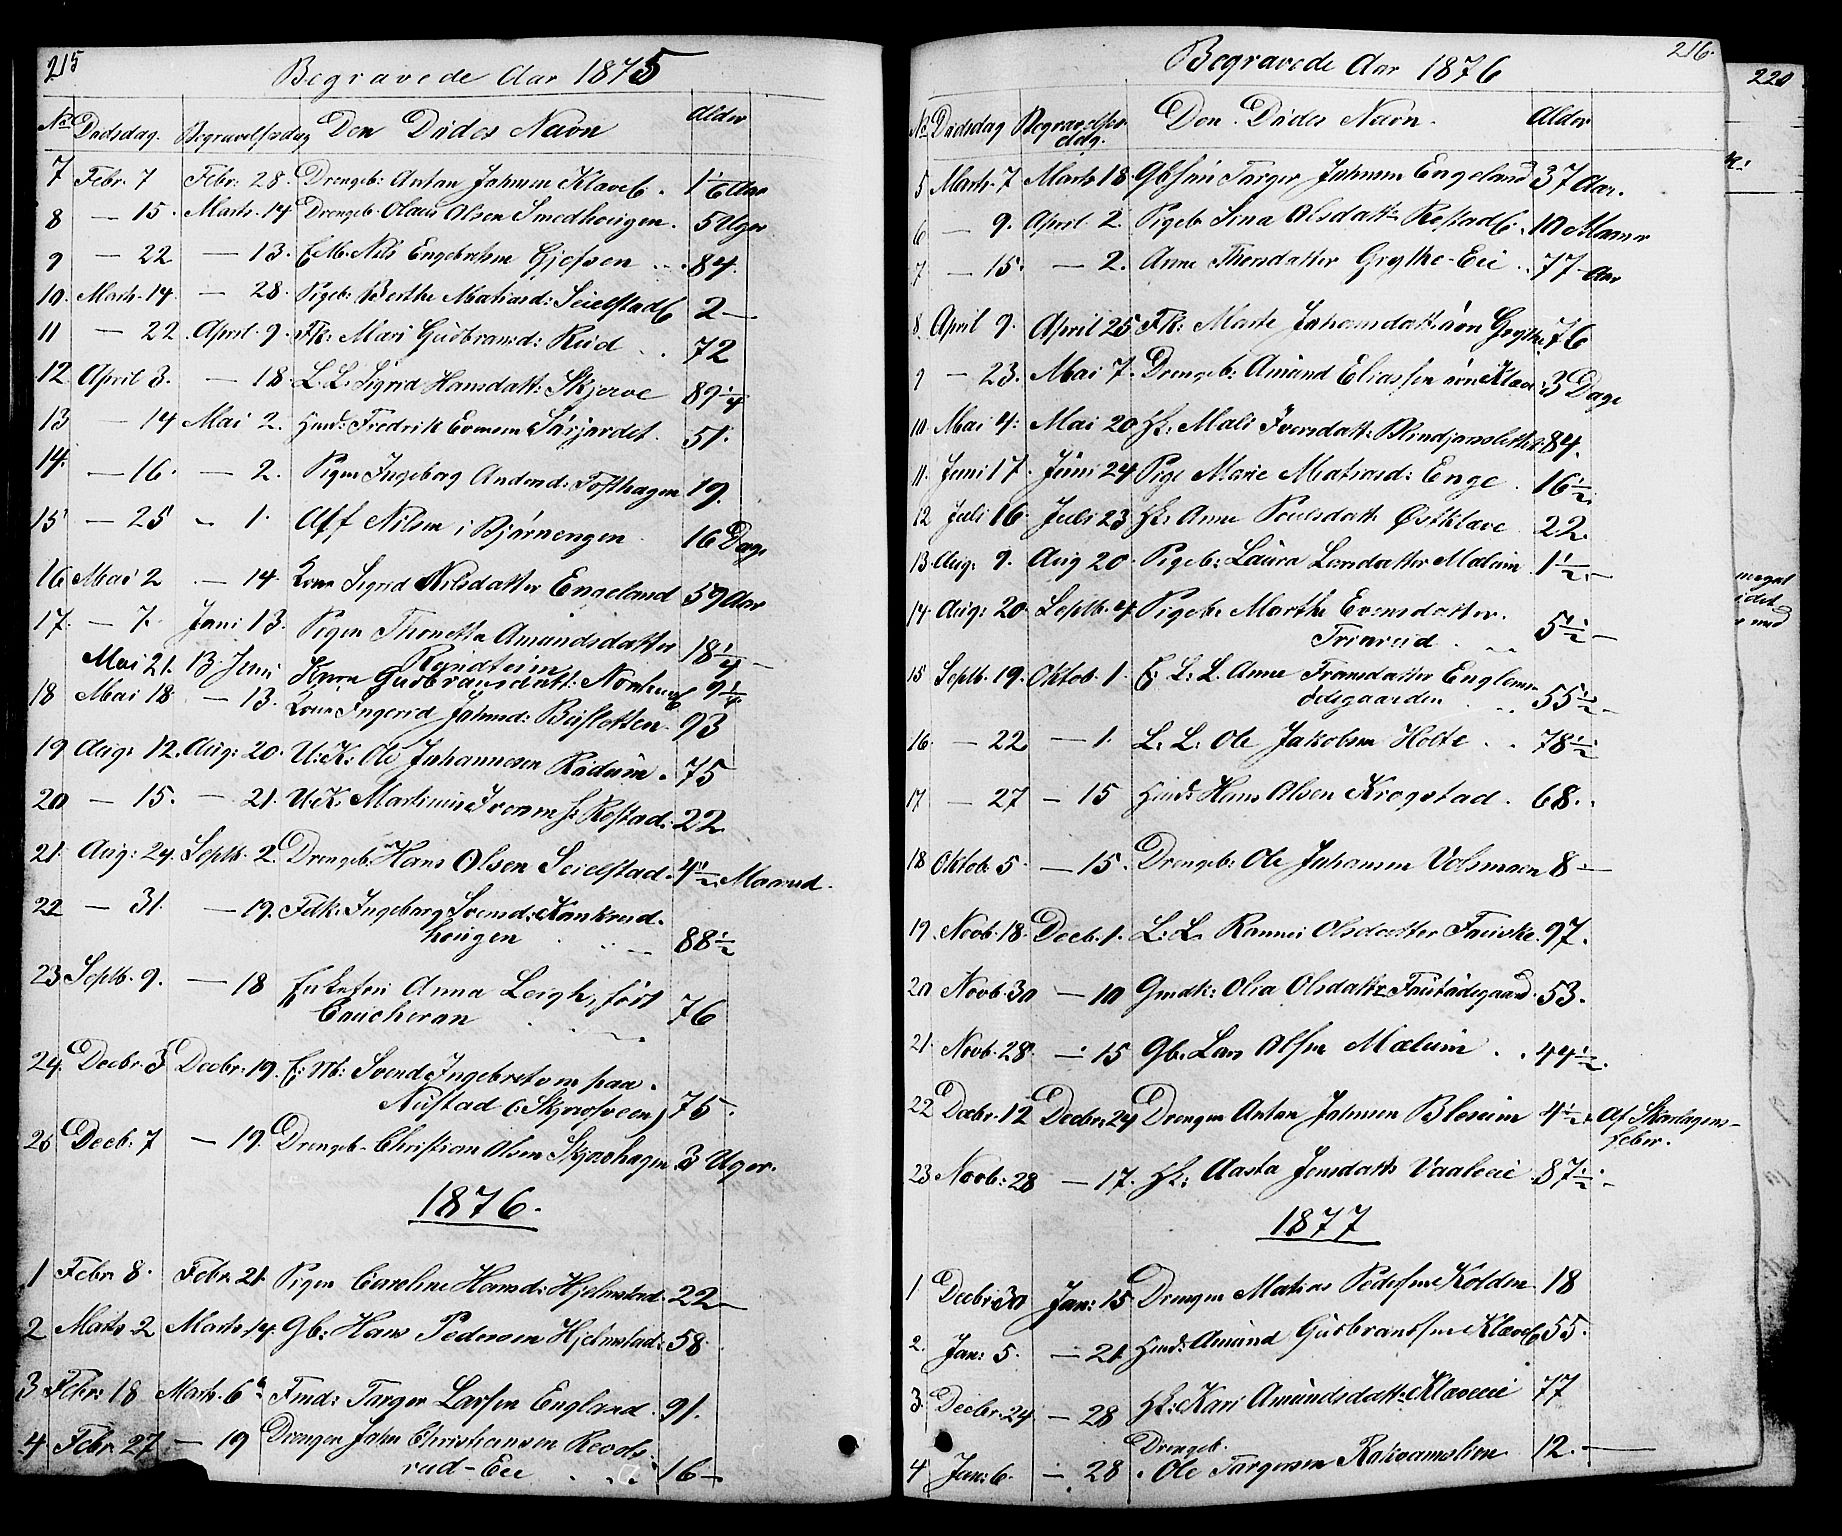 SAH, Østre Gausdal prestekontor, Klokkerbok nr. 1, 1863-1893, s. 215-216